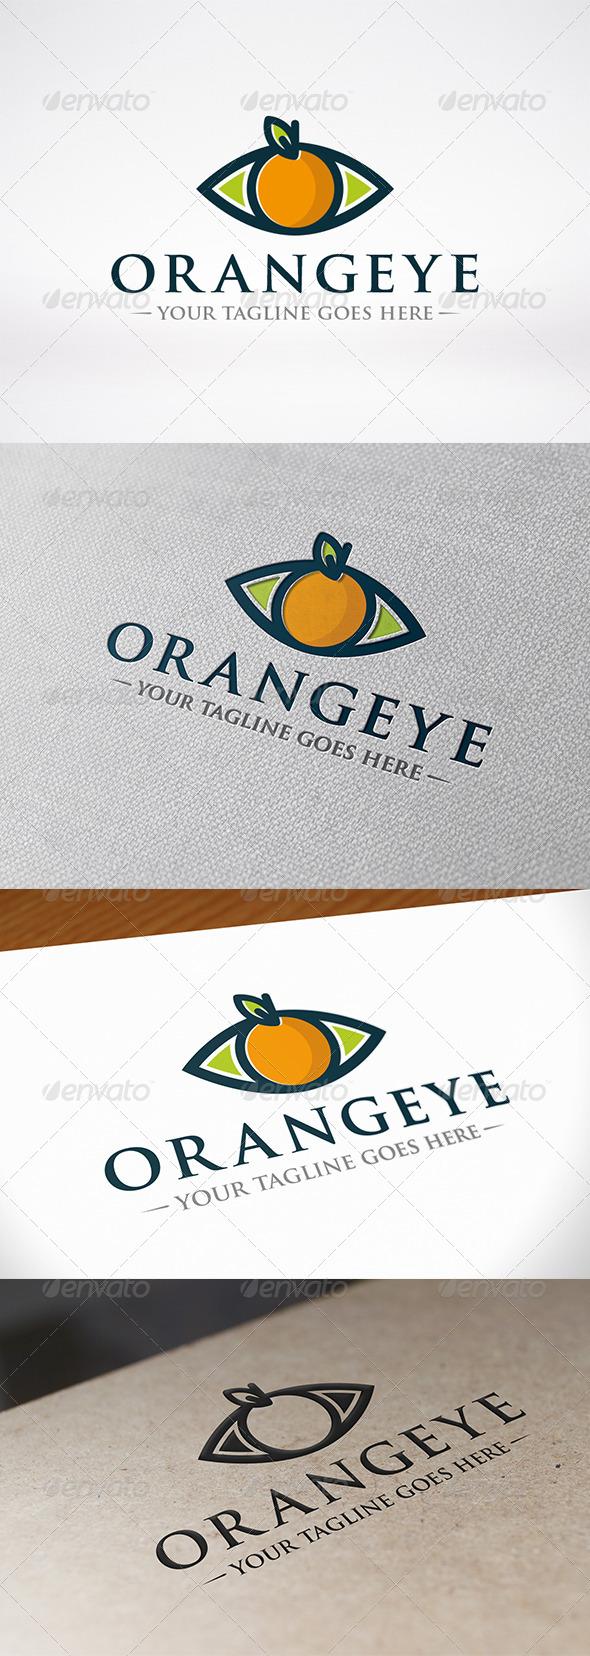 Orange Eye Logo Template